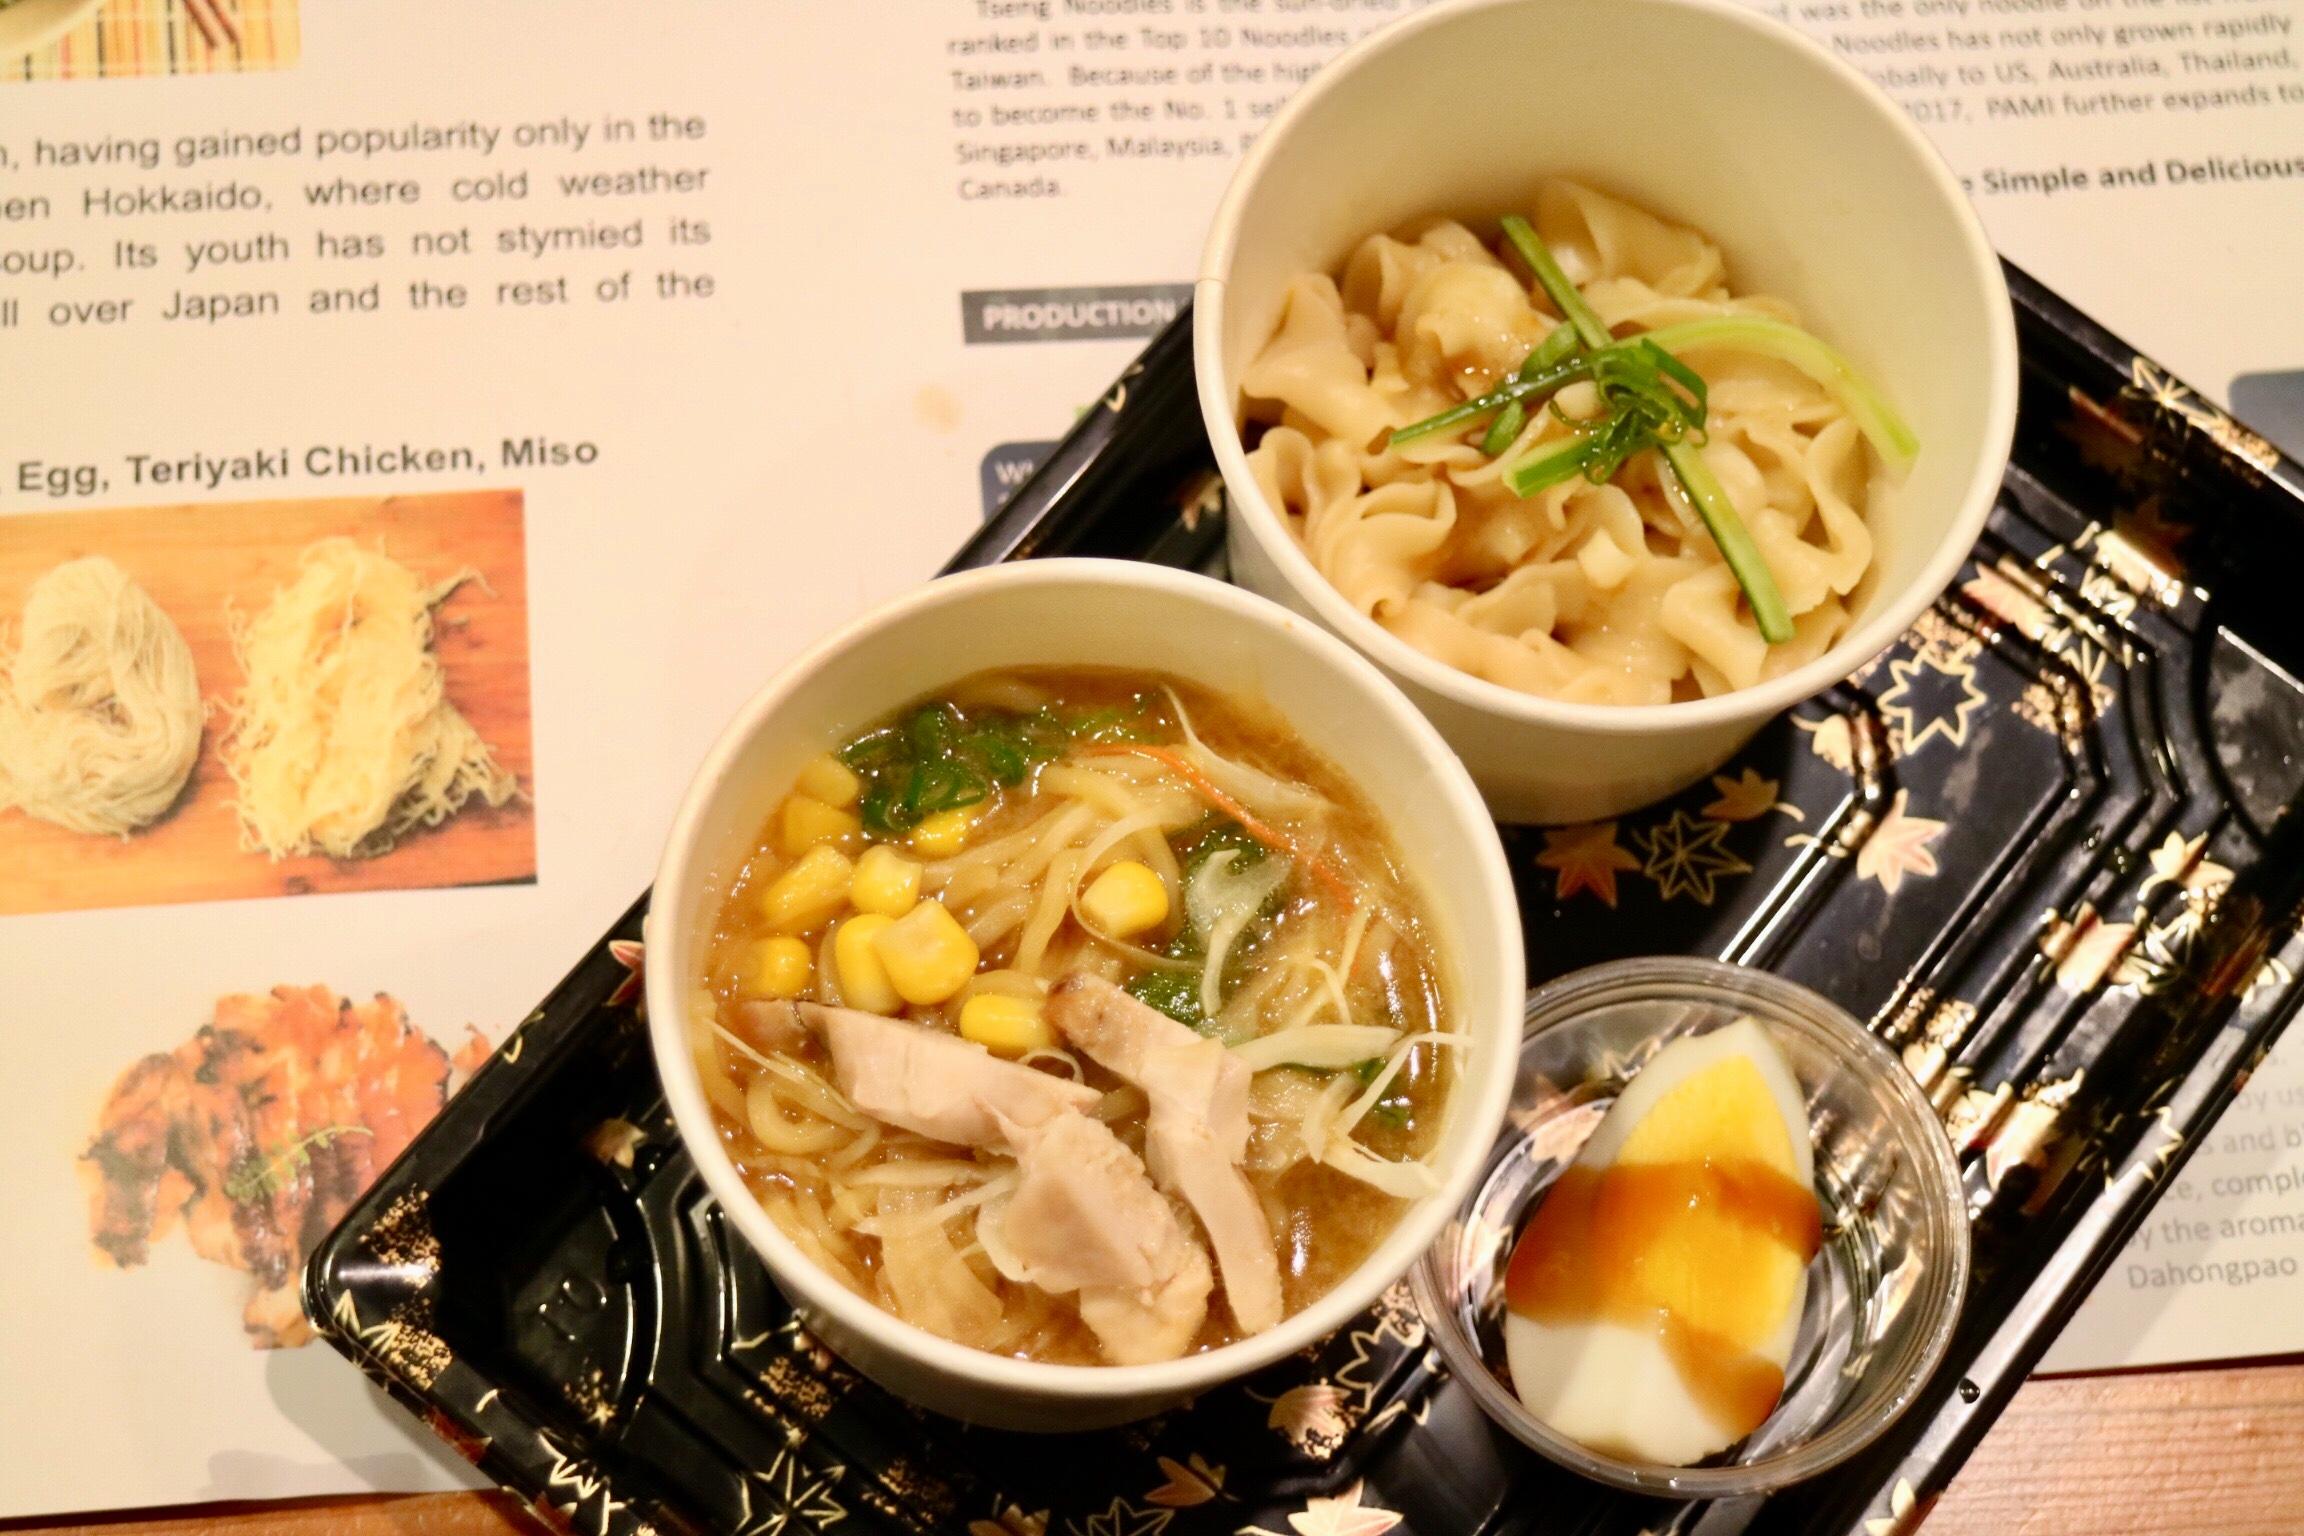 Spicy Tseng Noodles & Hokkaido Miso Ramen